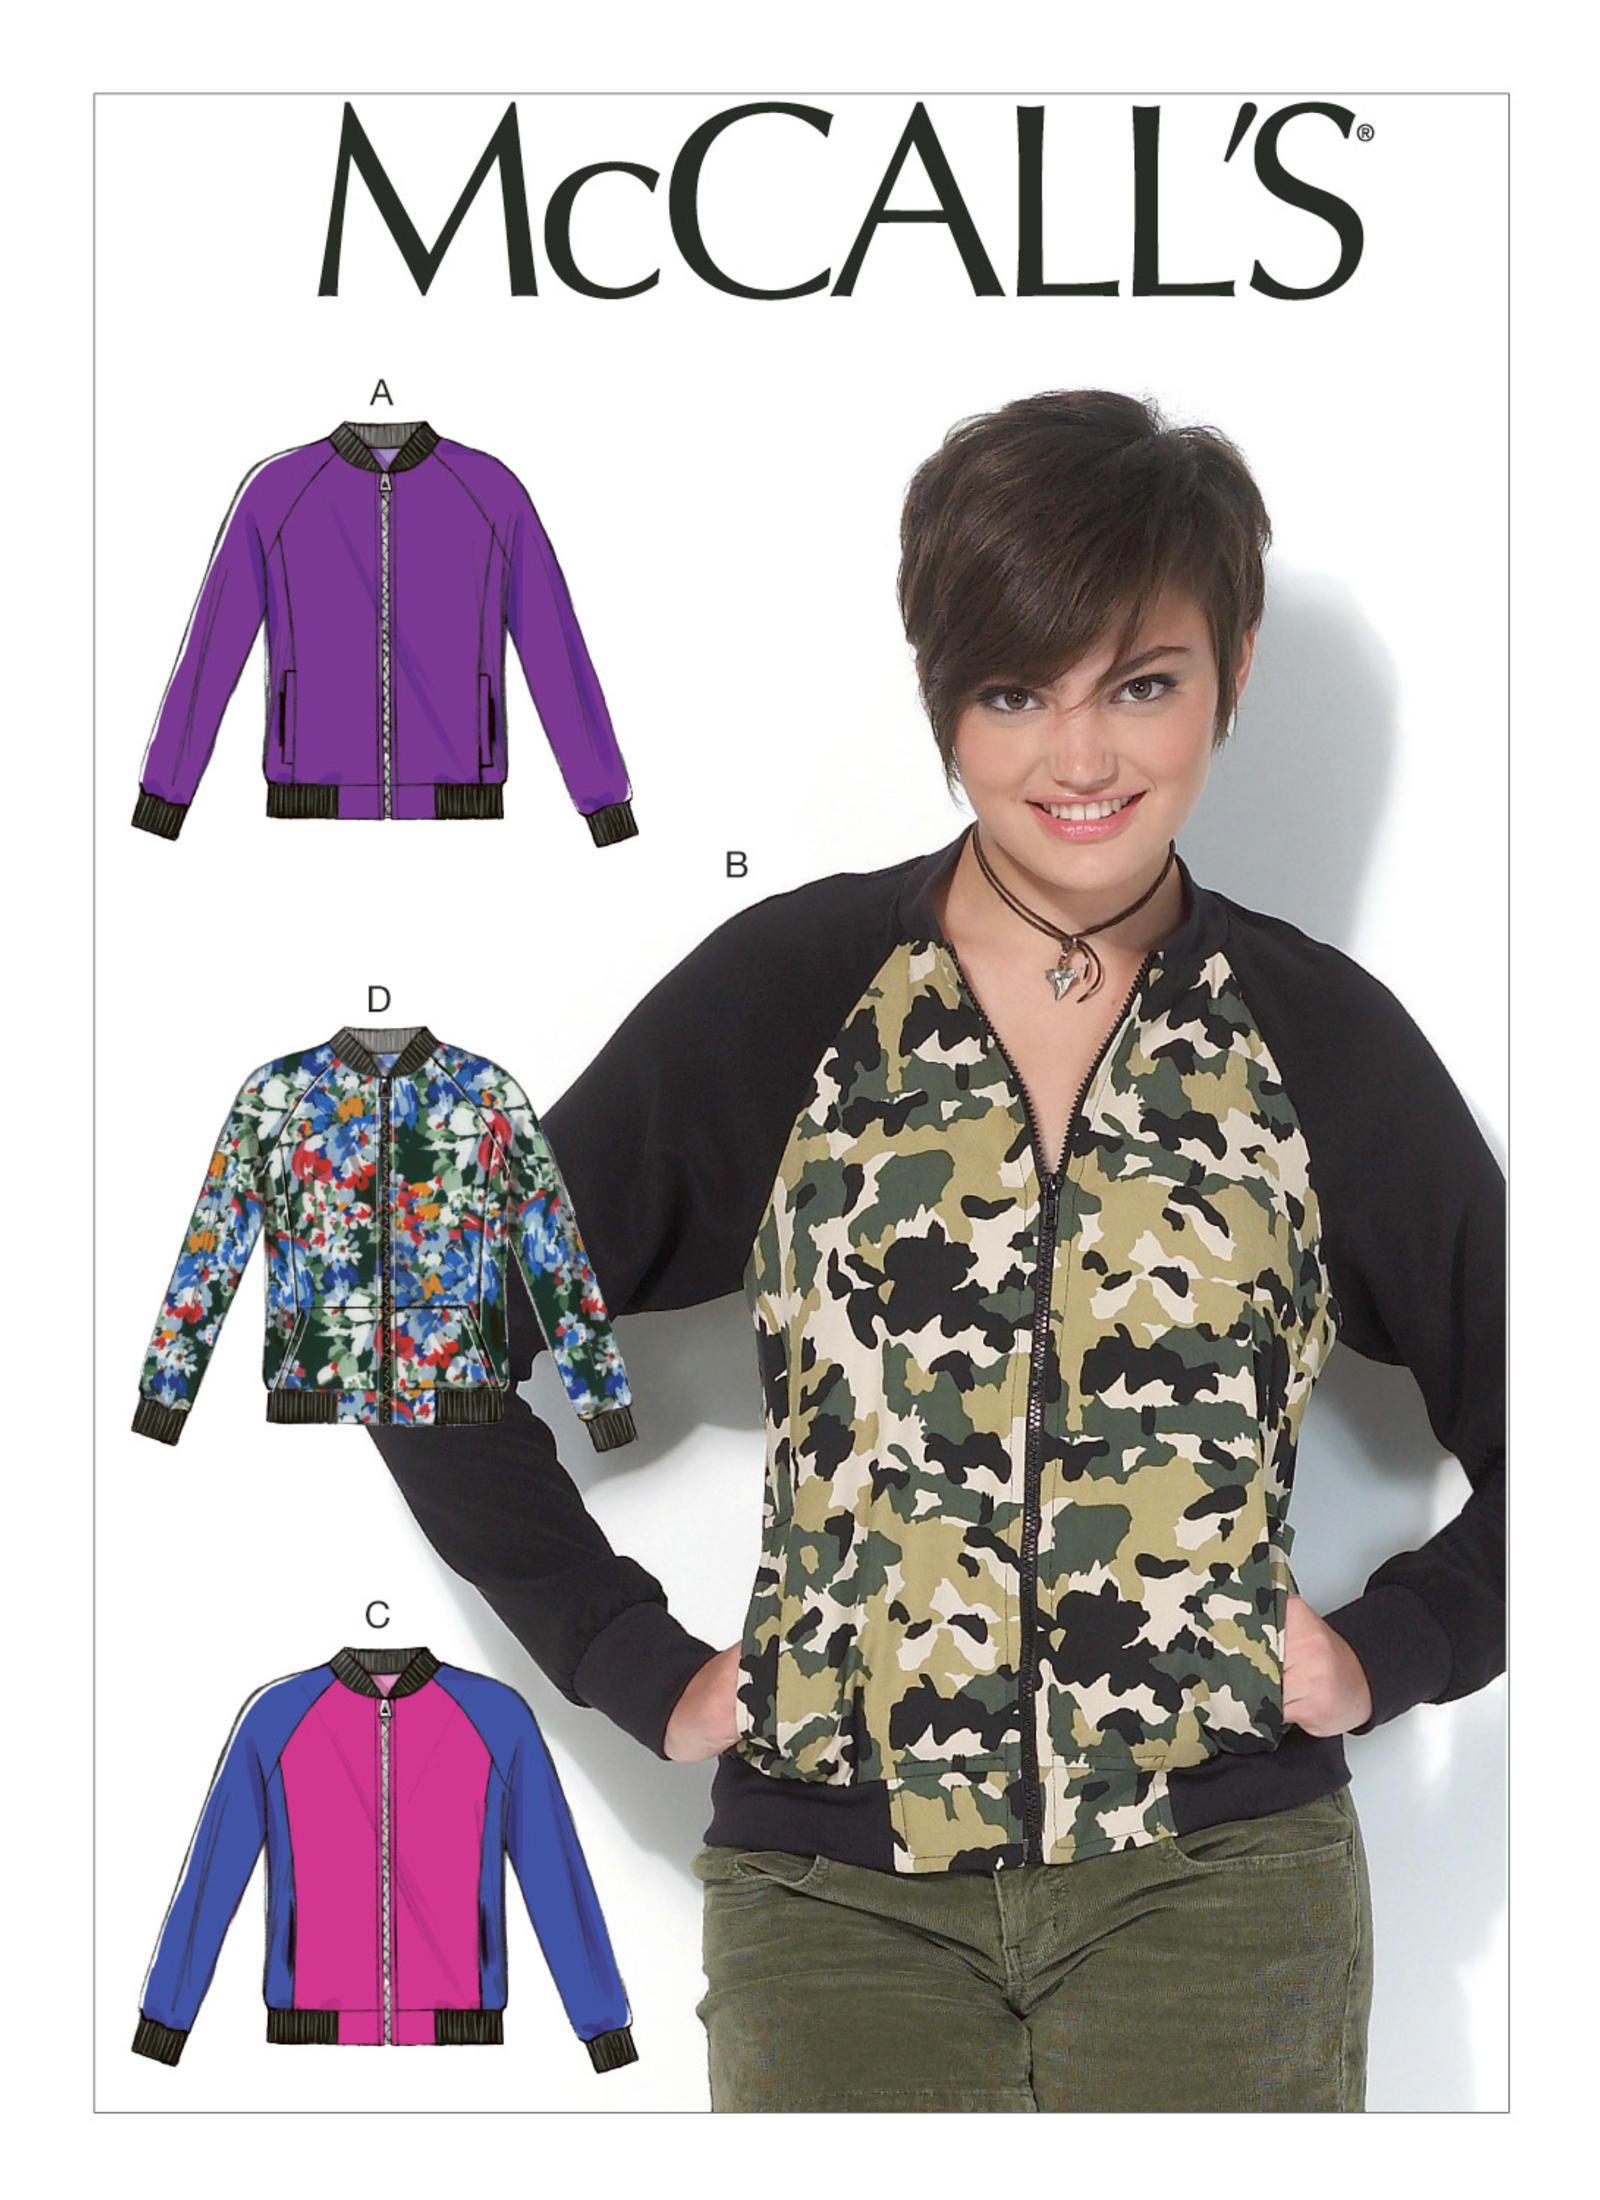 Pin By Cristina Mccoy On ביזנס Jacket Pattern Sewing Patterned Bomber Jacket Jacket Pattern [ 2200 x 1600 Pixel ]